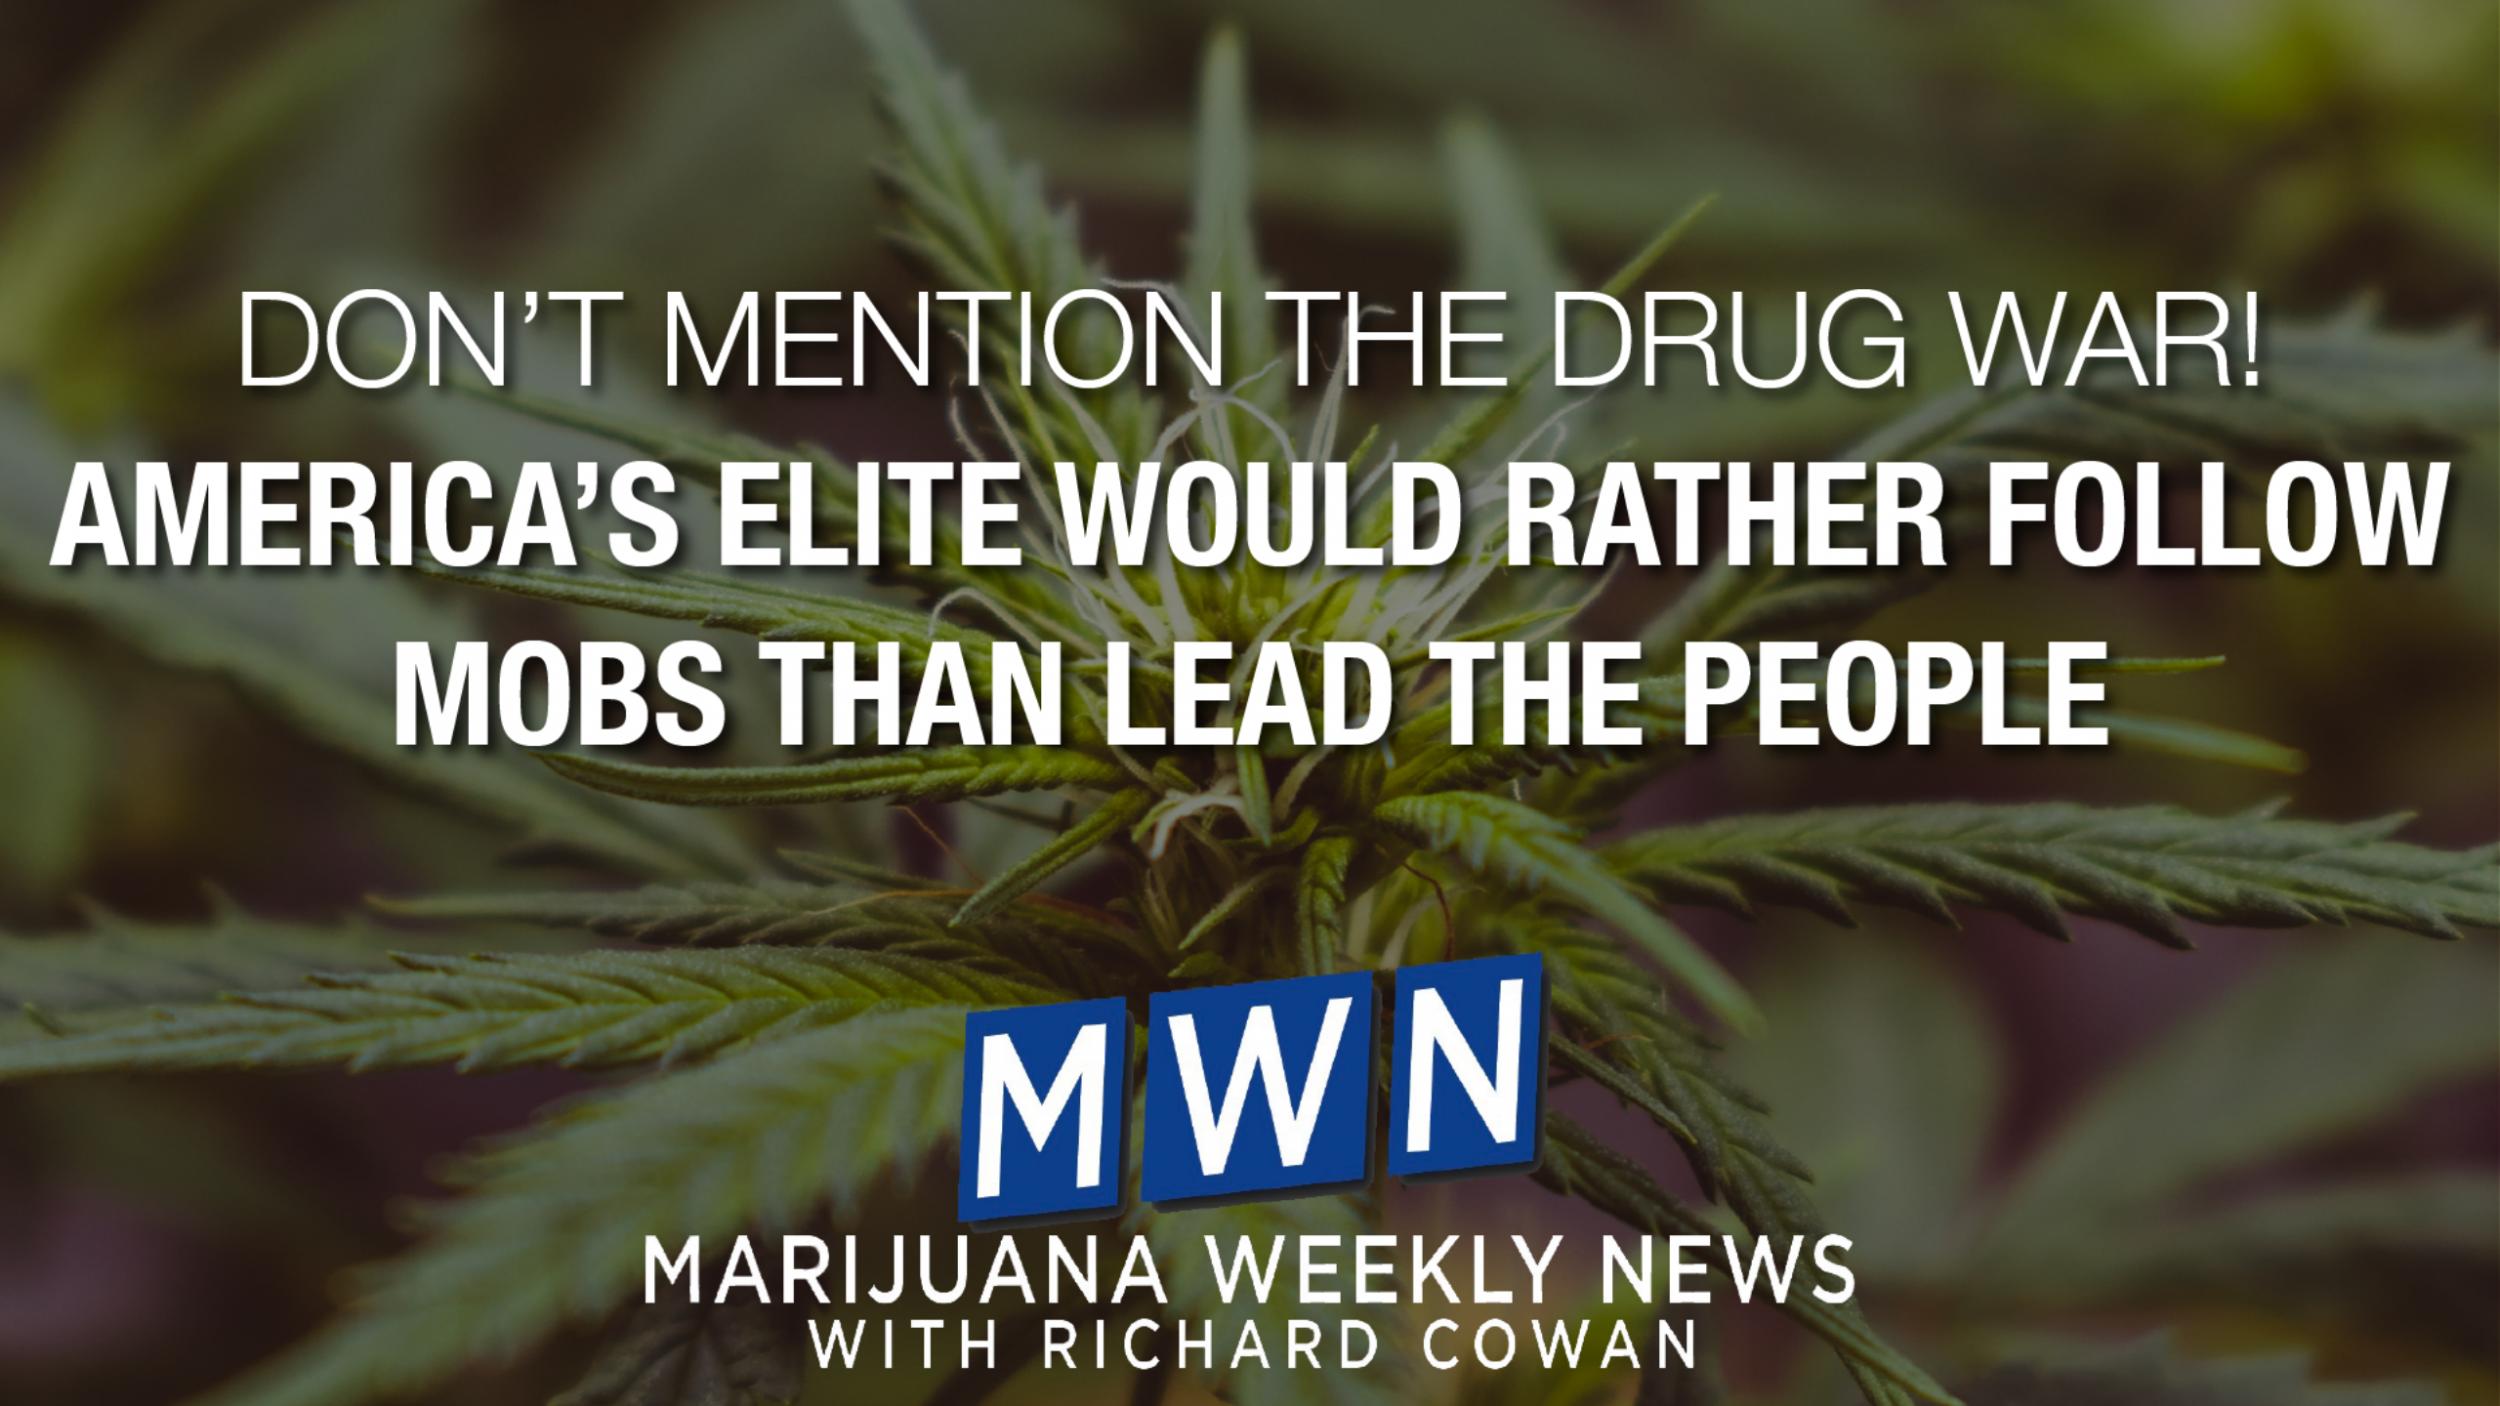 Newsweek AMPLIFY - Drug War